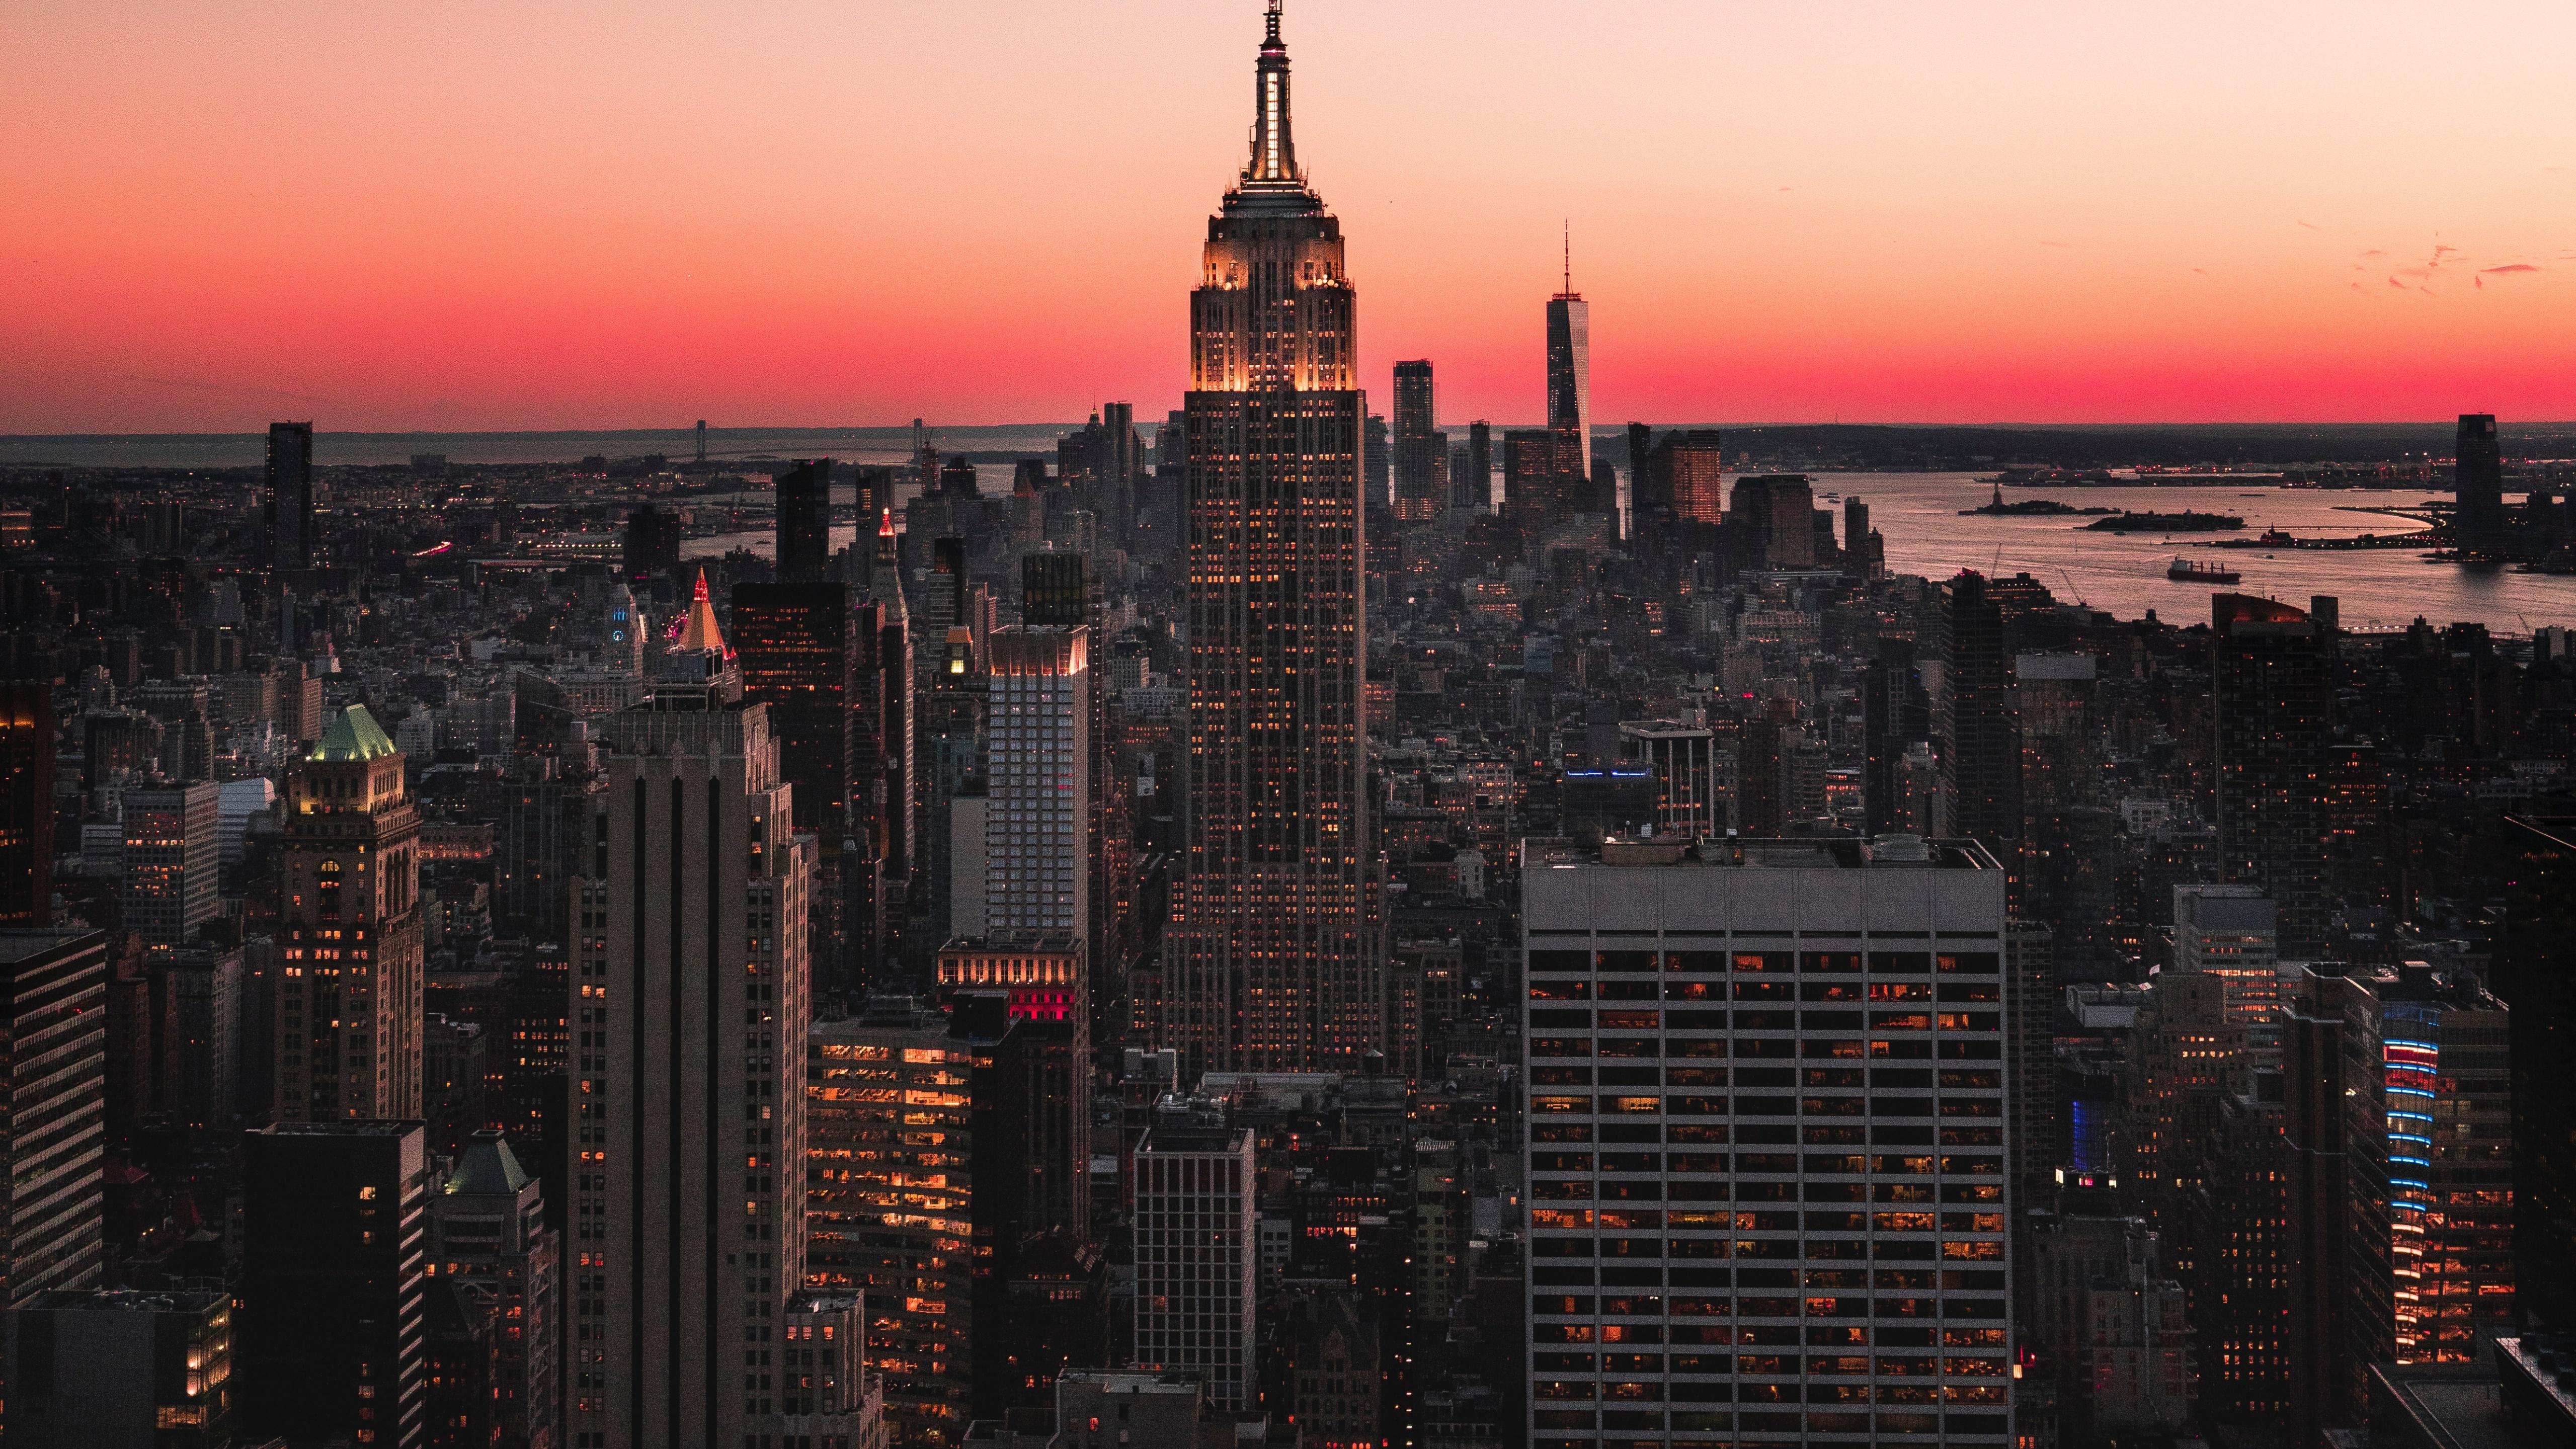 empire state building skyscraper new york city sunset 5120x2880 1706